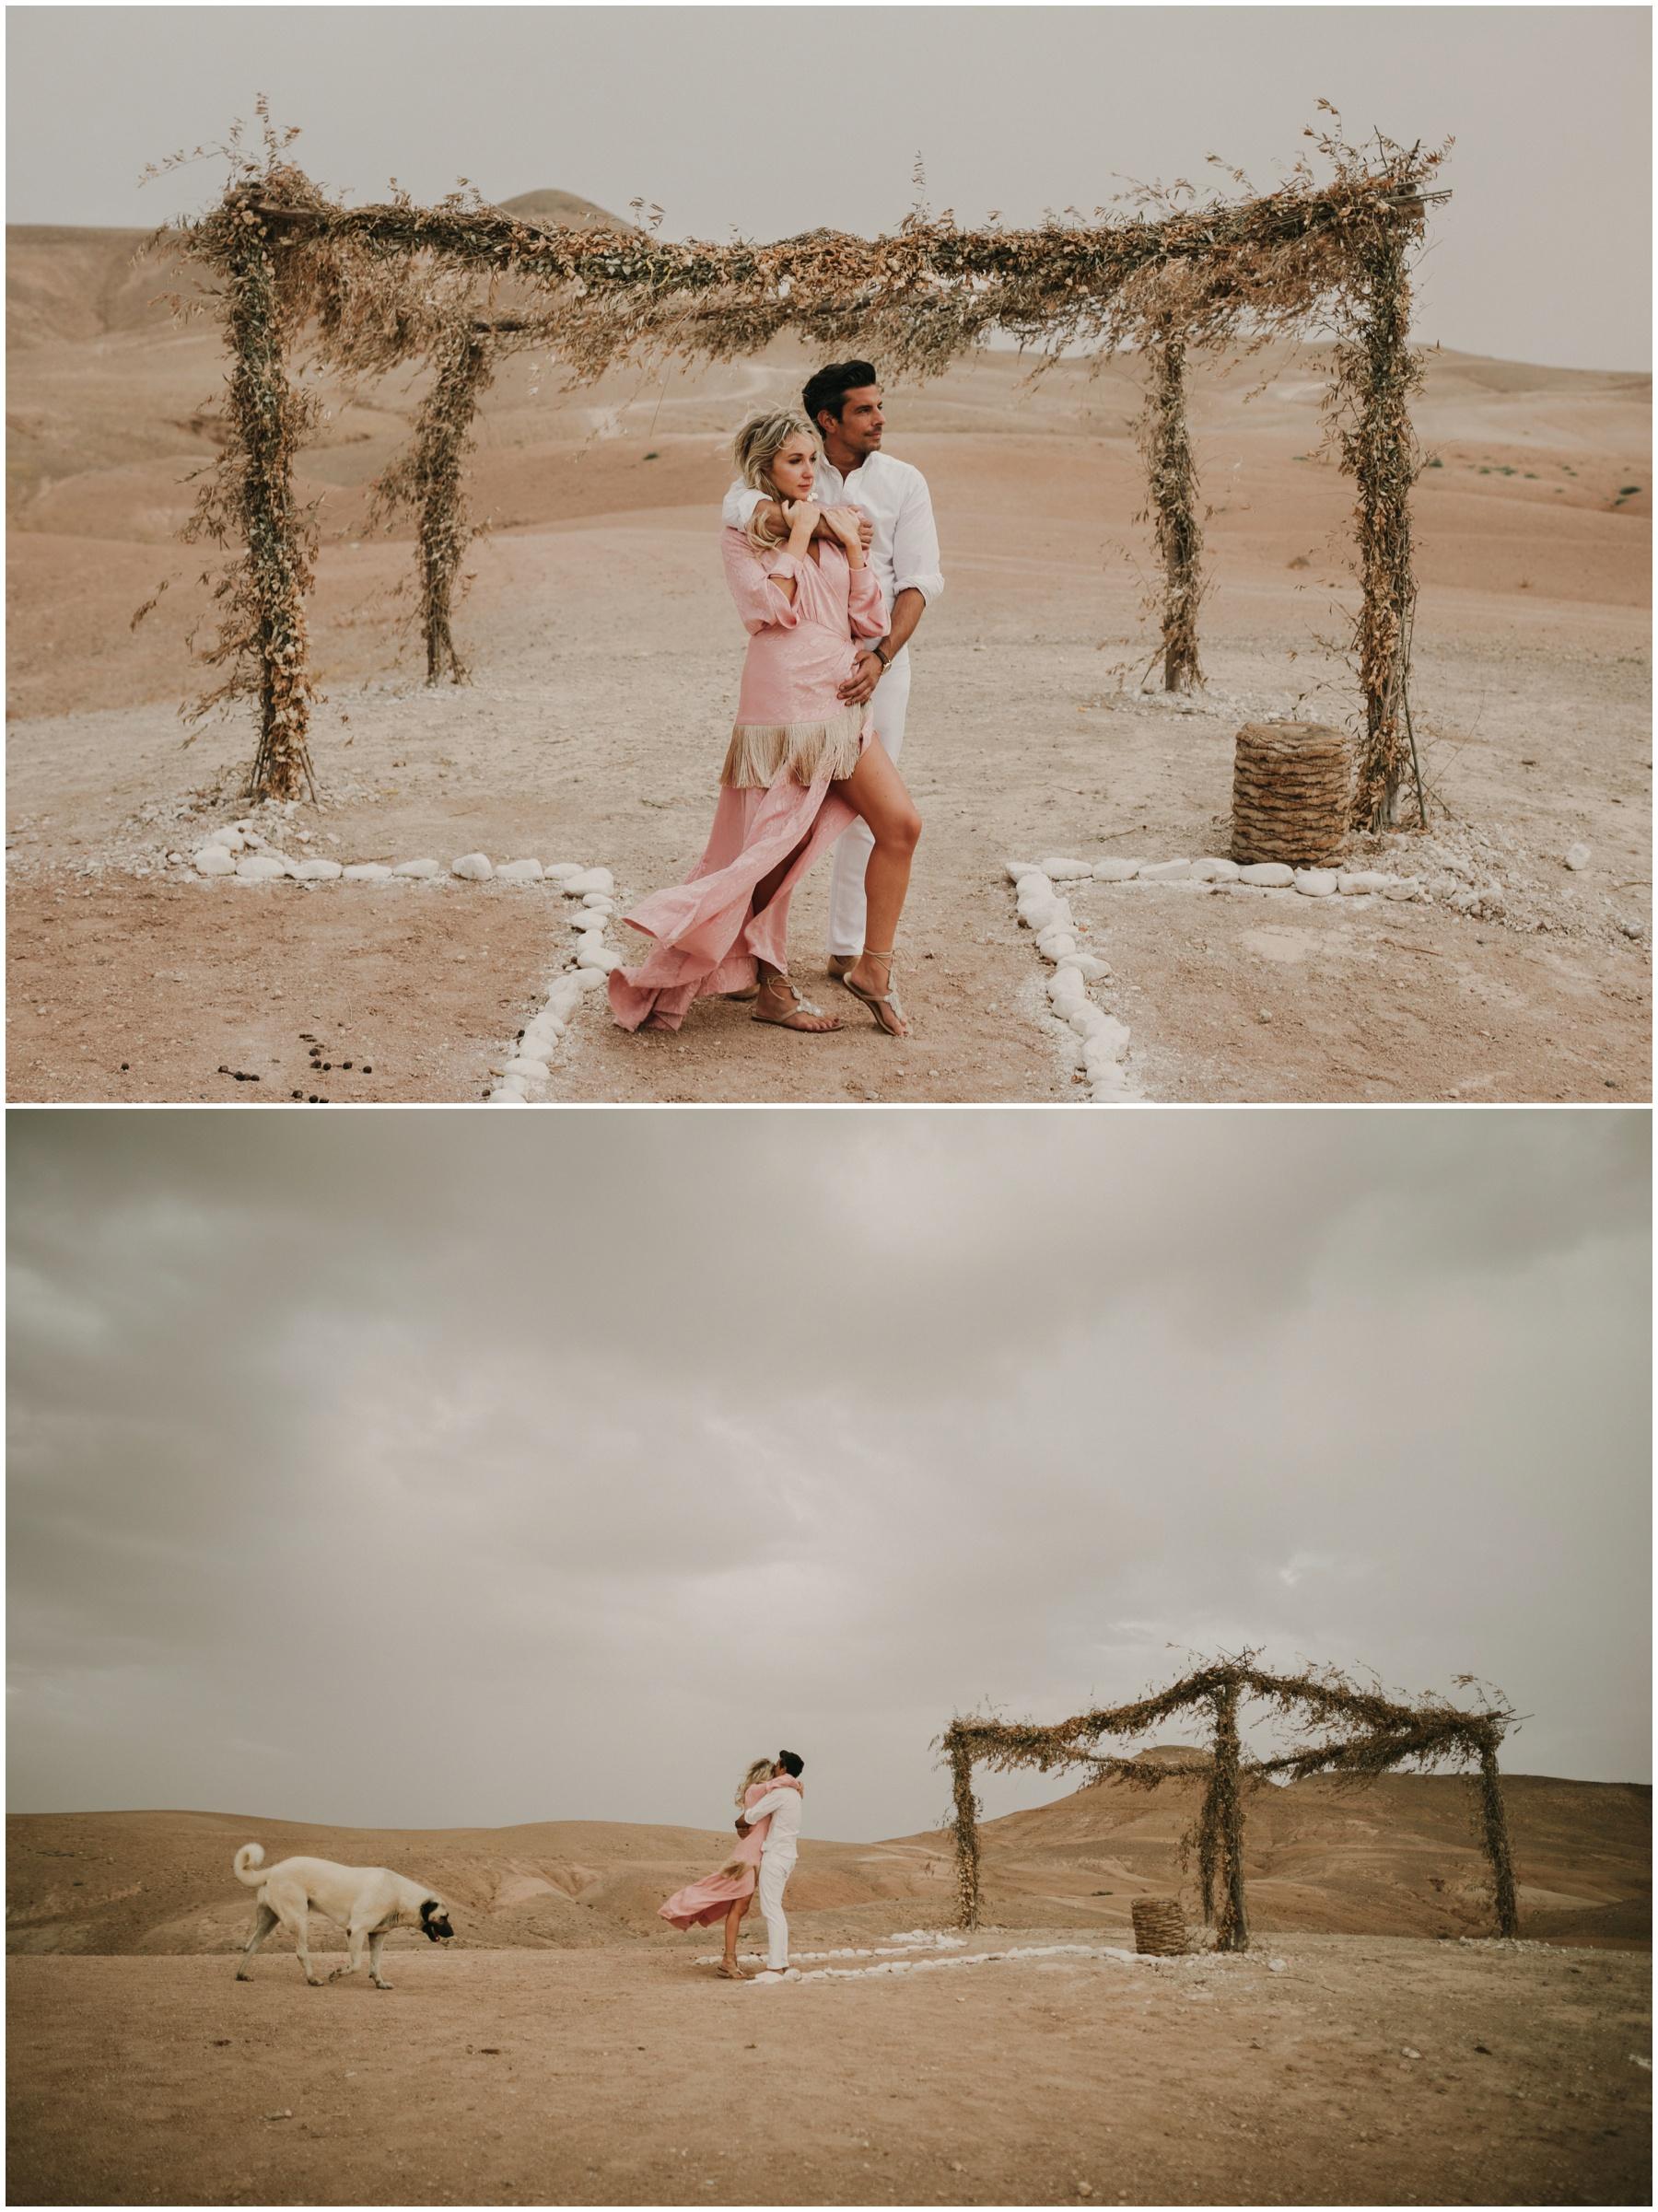 Marrakech Wedding La Pause 009.JPG